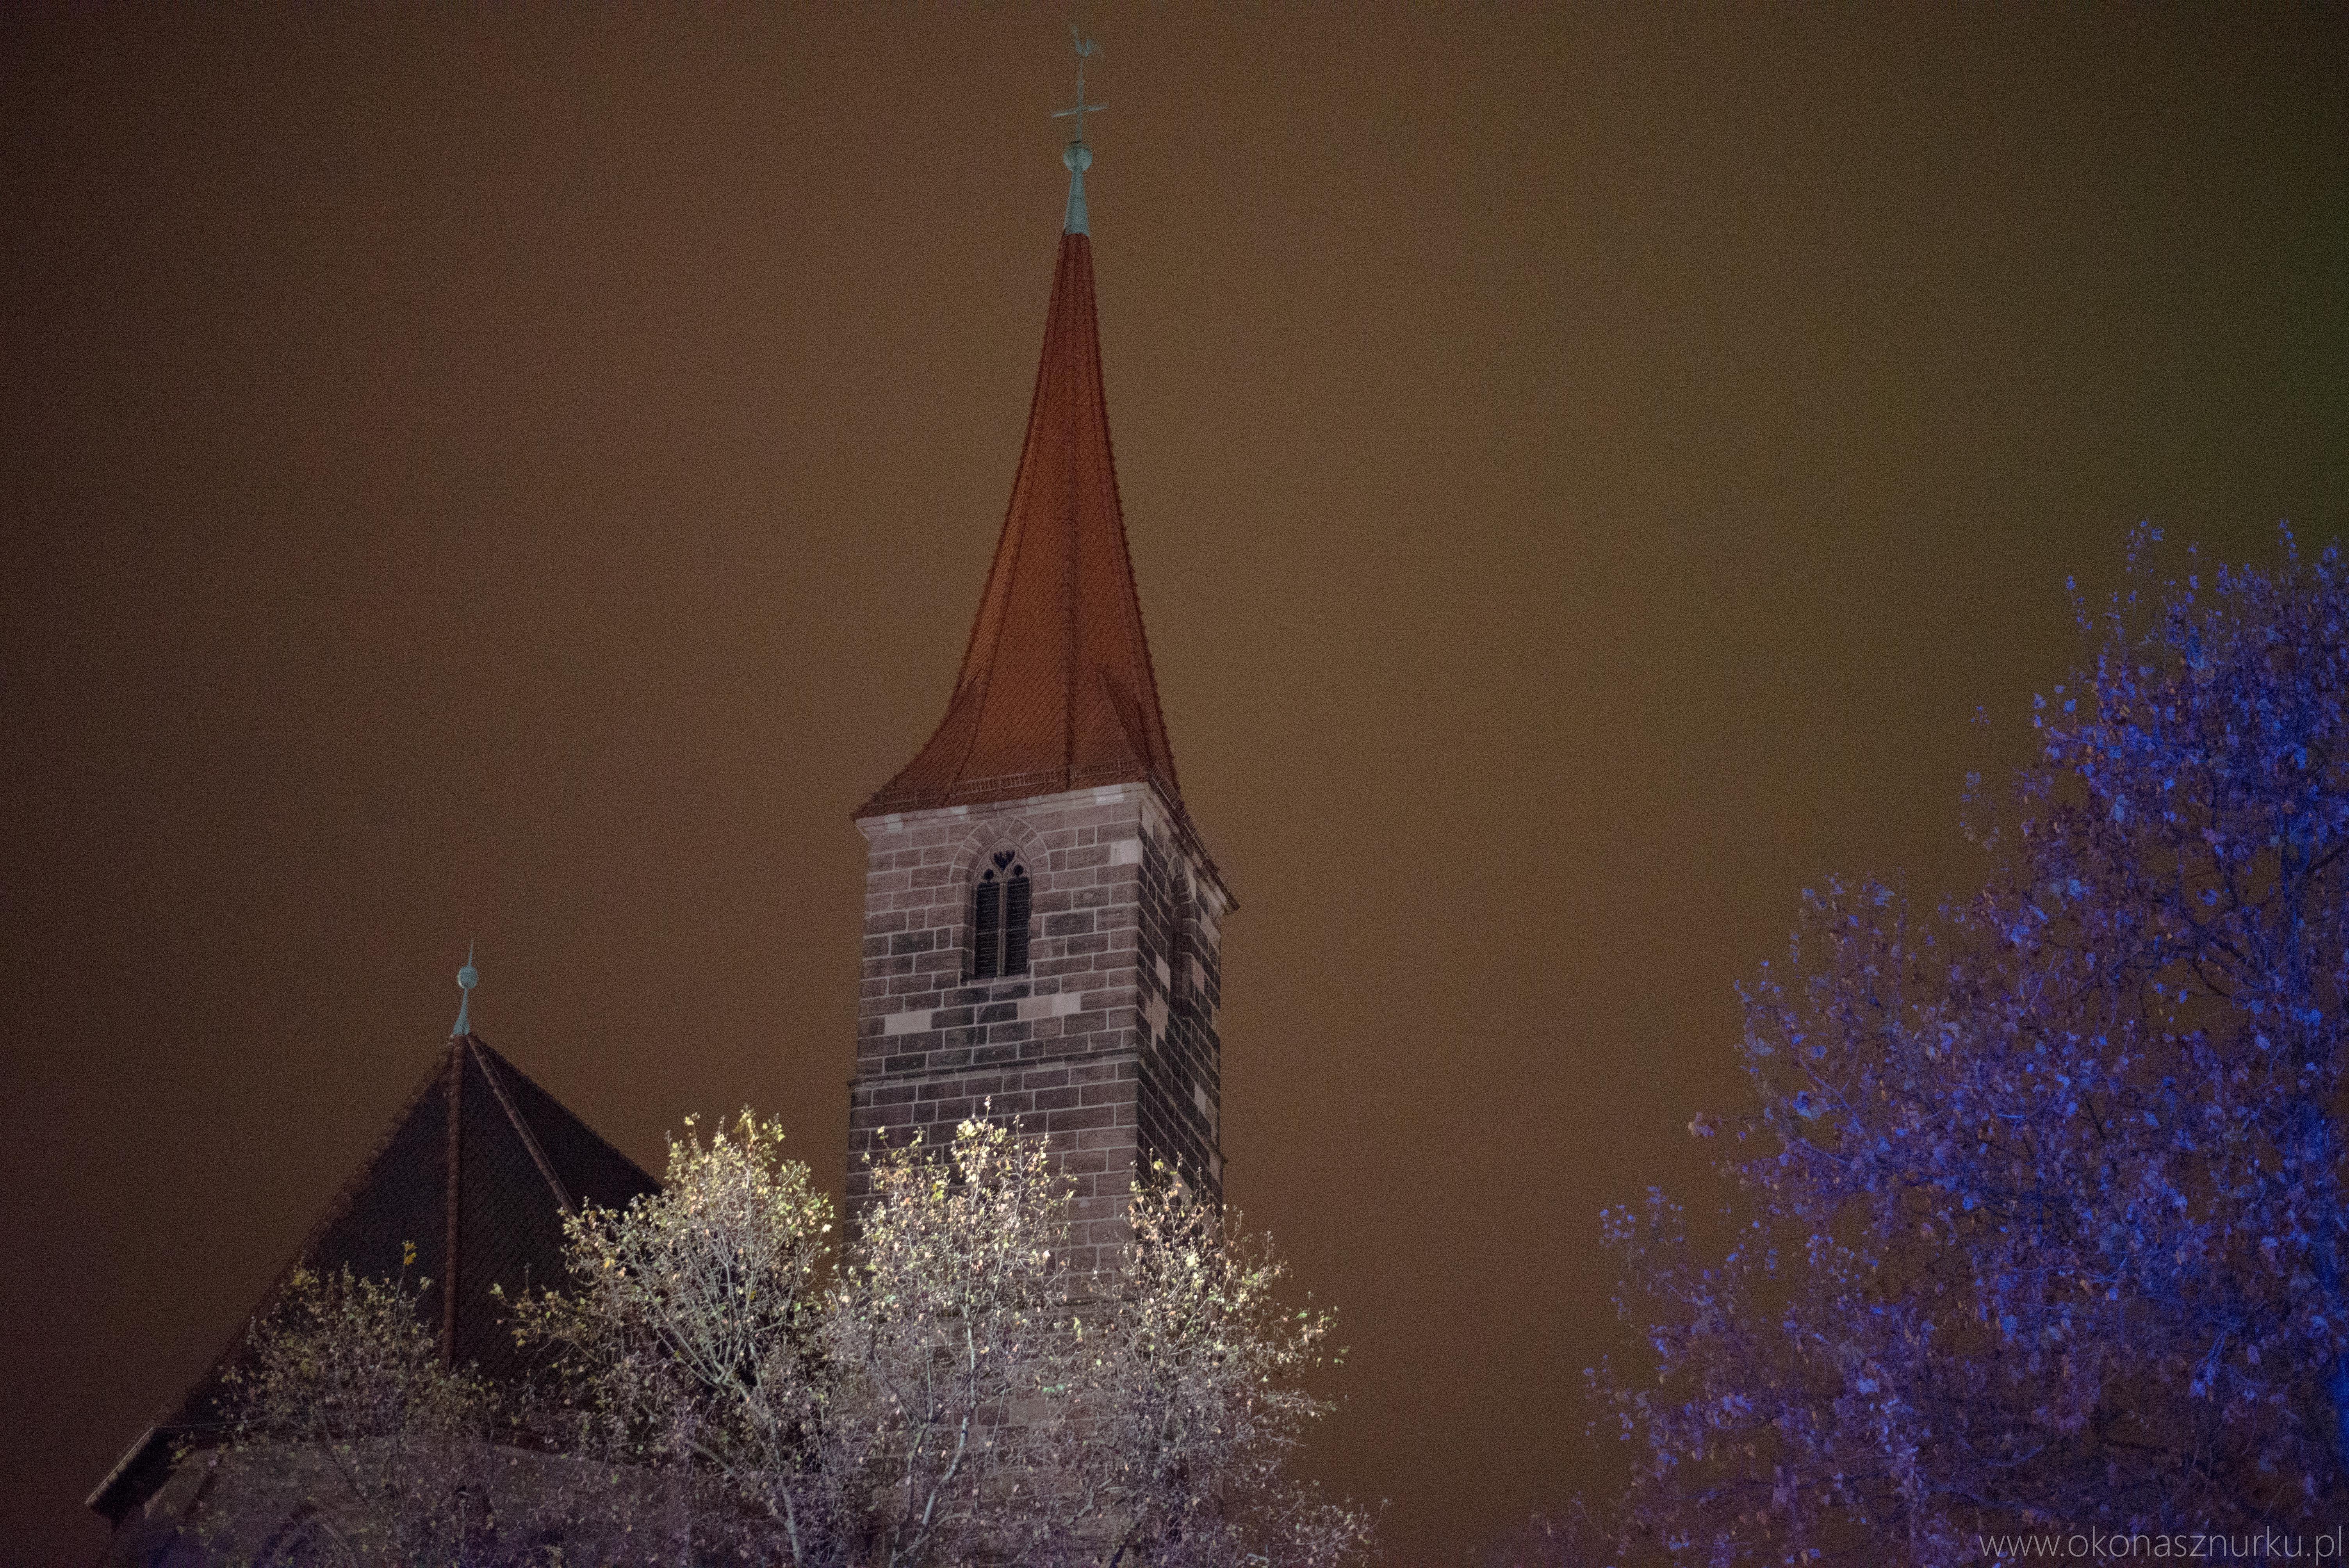 Nürnberg-stadt-norymberga-bayern-city-frankonia (9)